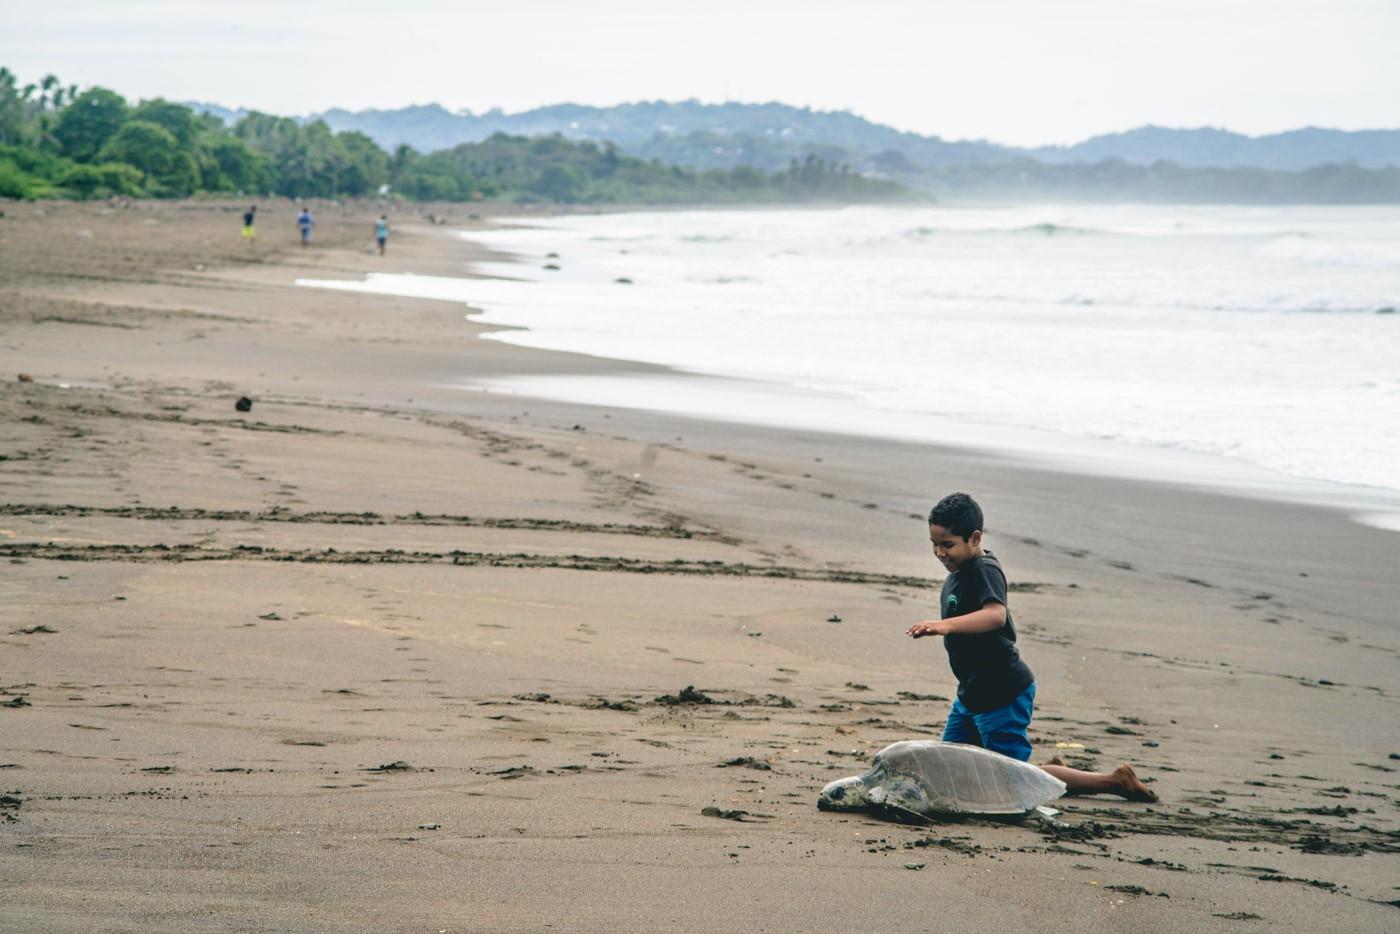 Costa Rica Playa Ostional-4470